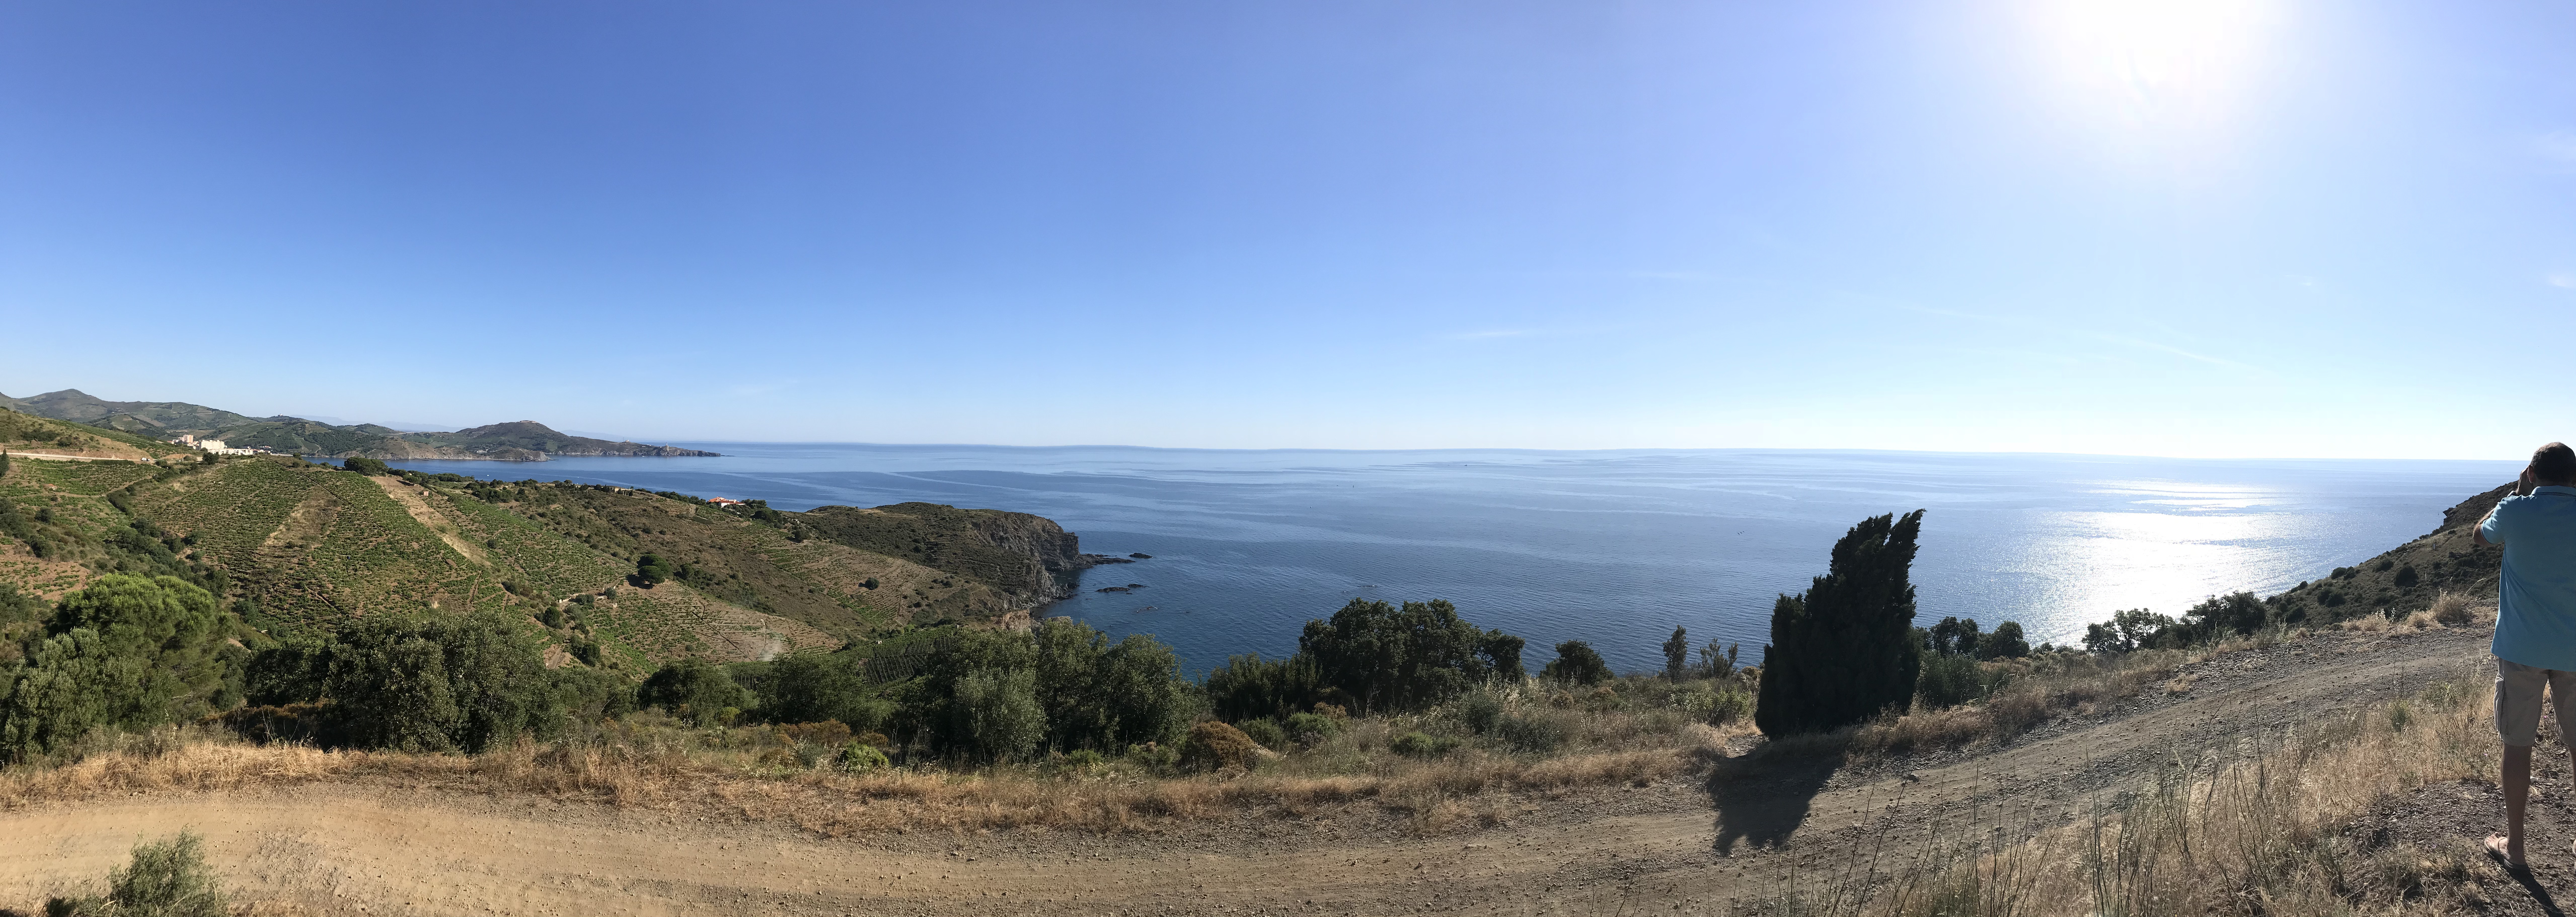 Baie de Cadaqués